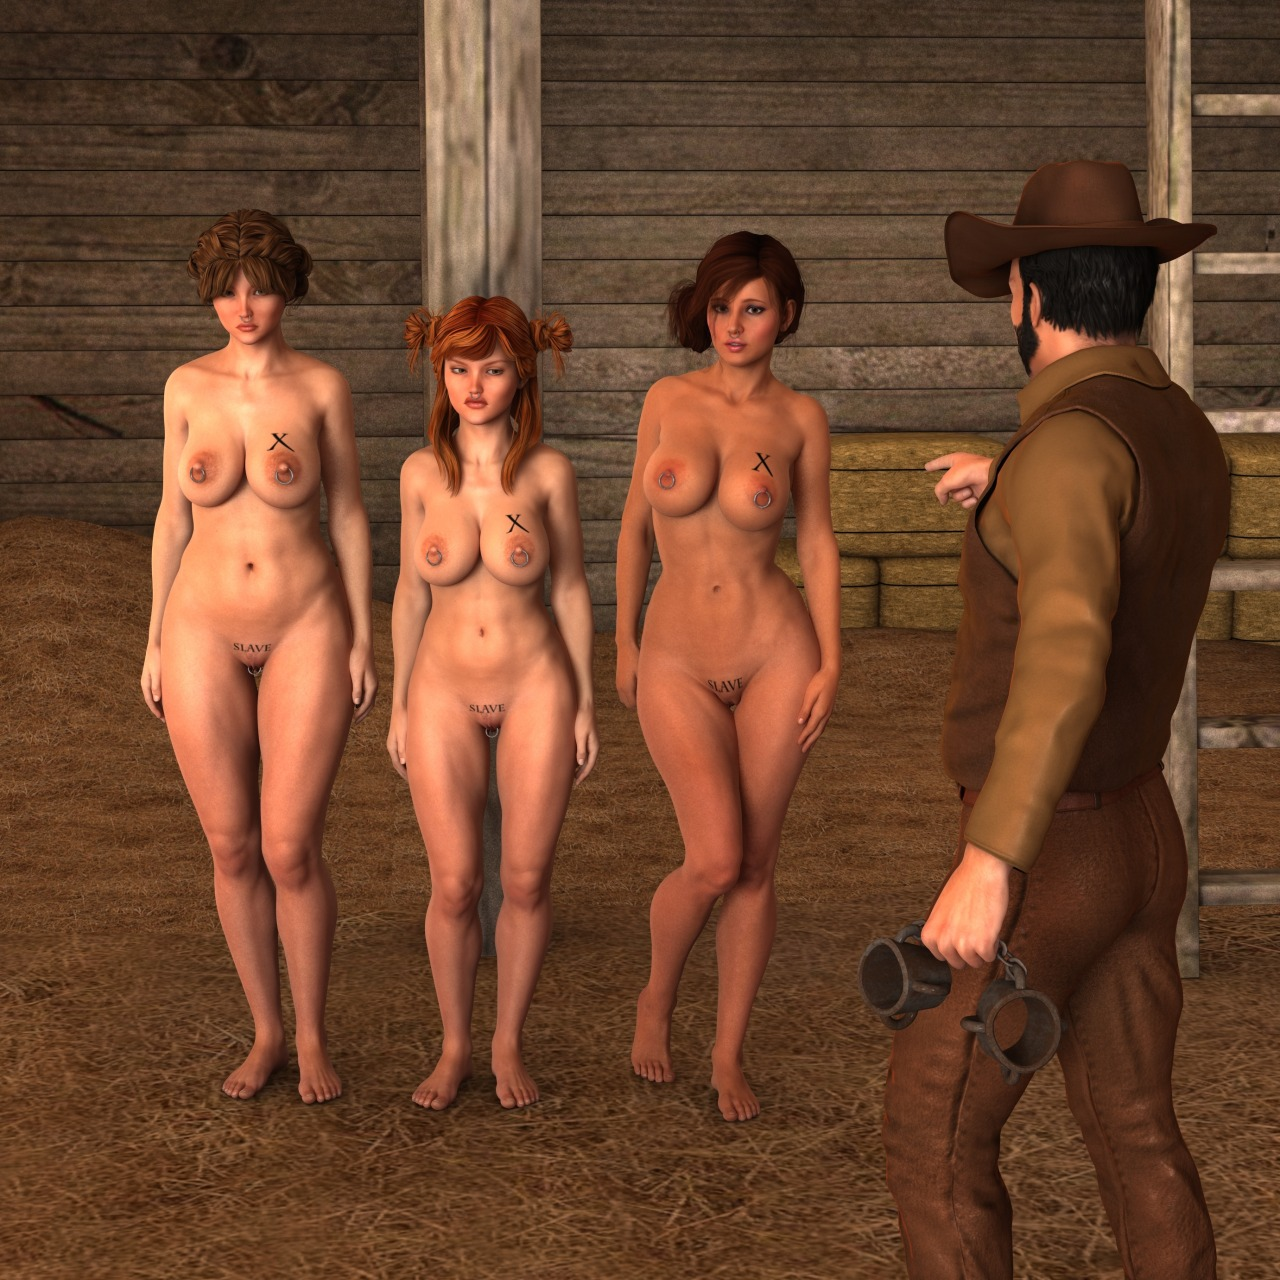 nude cartoons tumblr